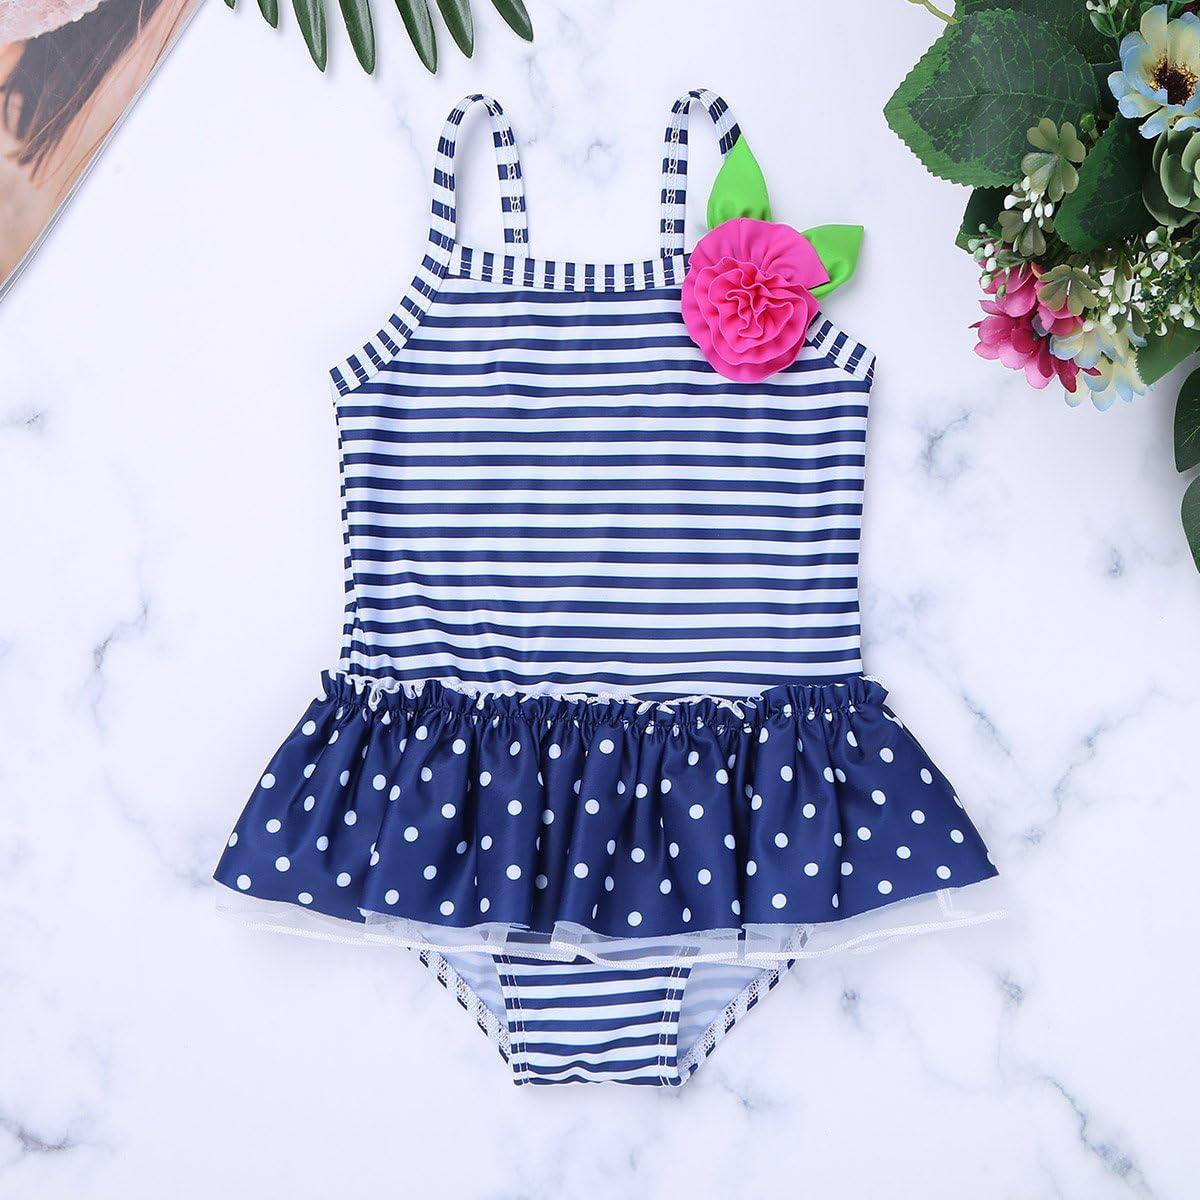 Freebily Baby M/ädchen Badeanzug Polka Dots Badebekleidung Kleinkind Schwimmanzug Bademode Badeset Baderock